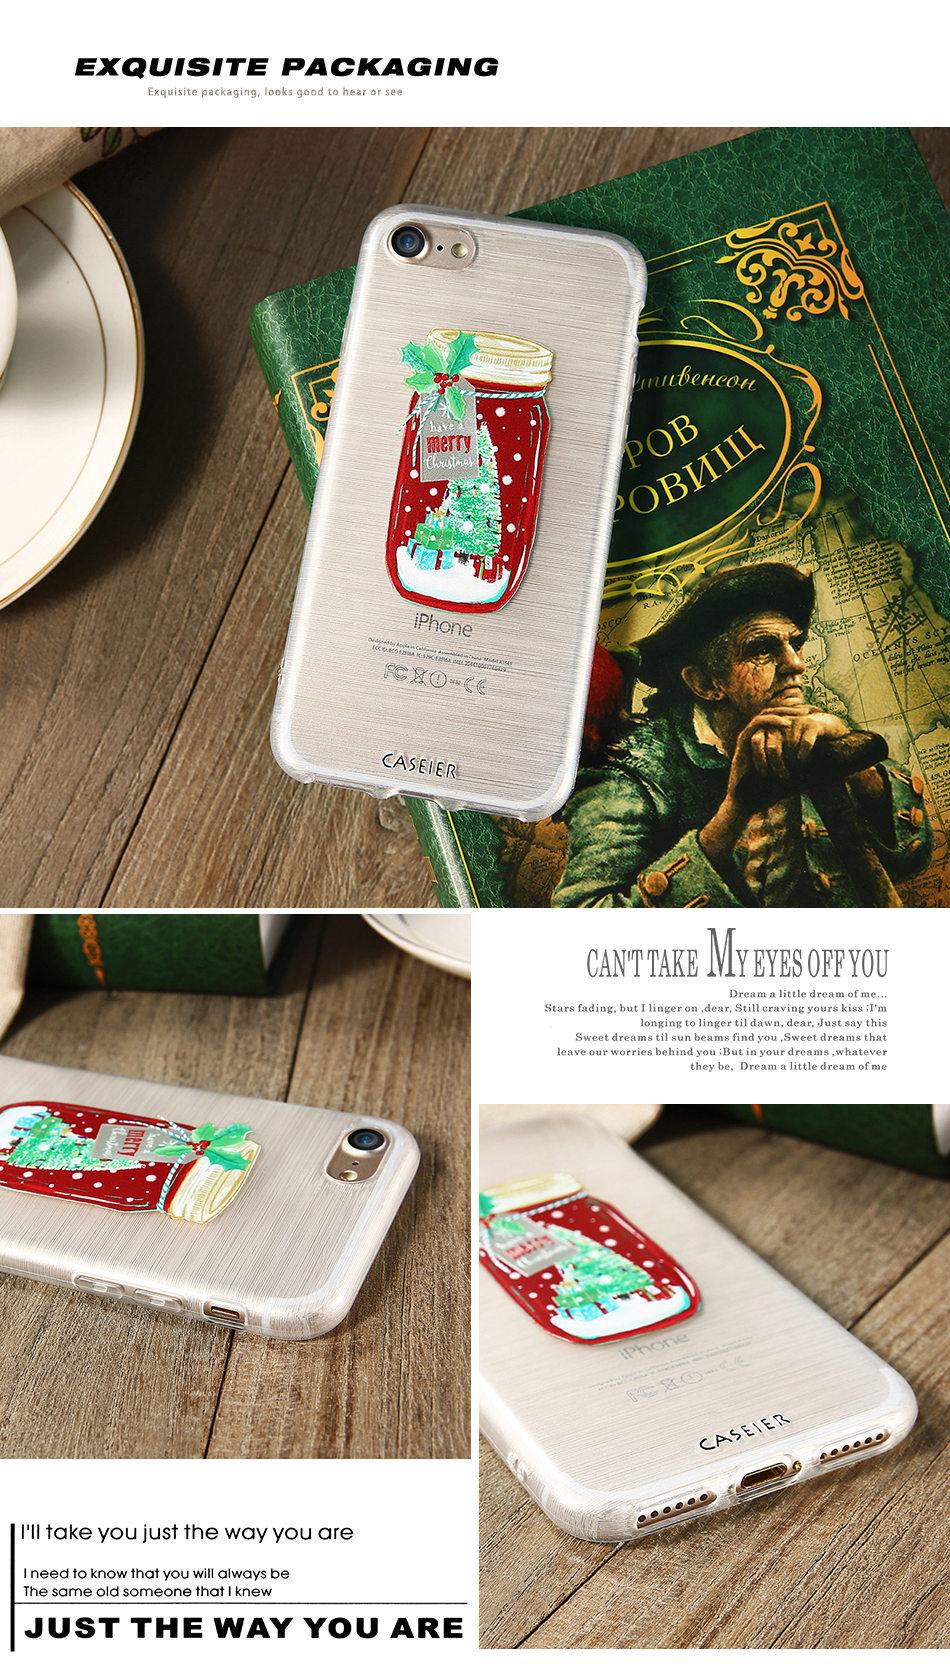 HTB1mgnOOpXXXXafapXXq6xXFXXXc - Christmas Phone Case For iPhone 7 6 6S Plus iPhone 5S SE 5 Cases For Samsung Galaxy S6 S7 Edge Cute Cover Accessories PTC 286